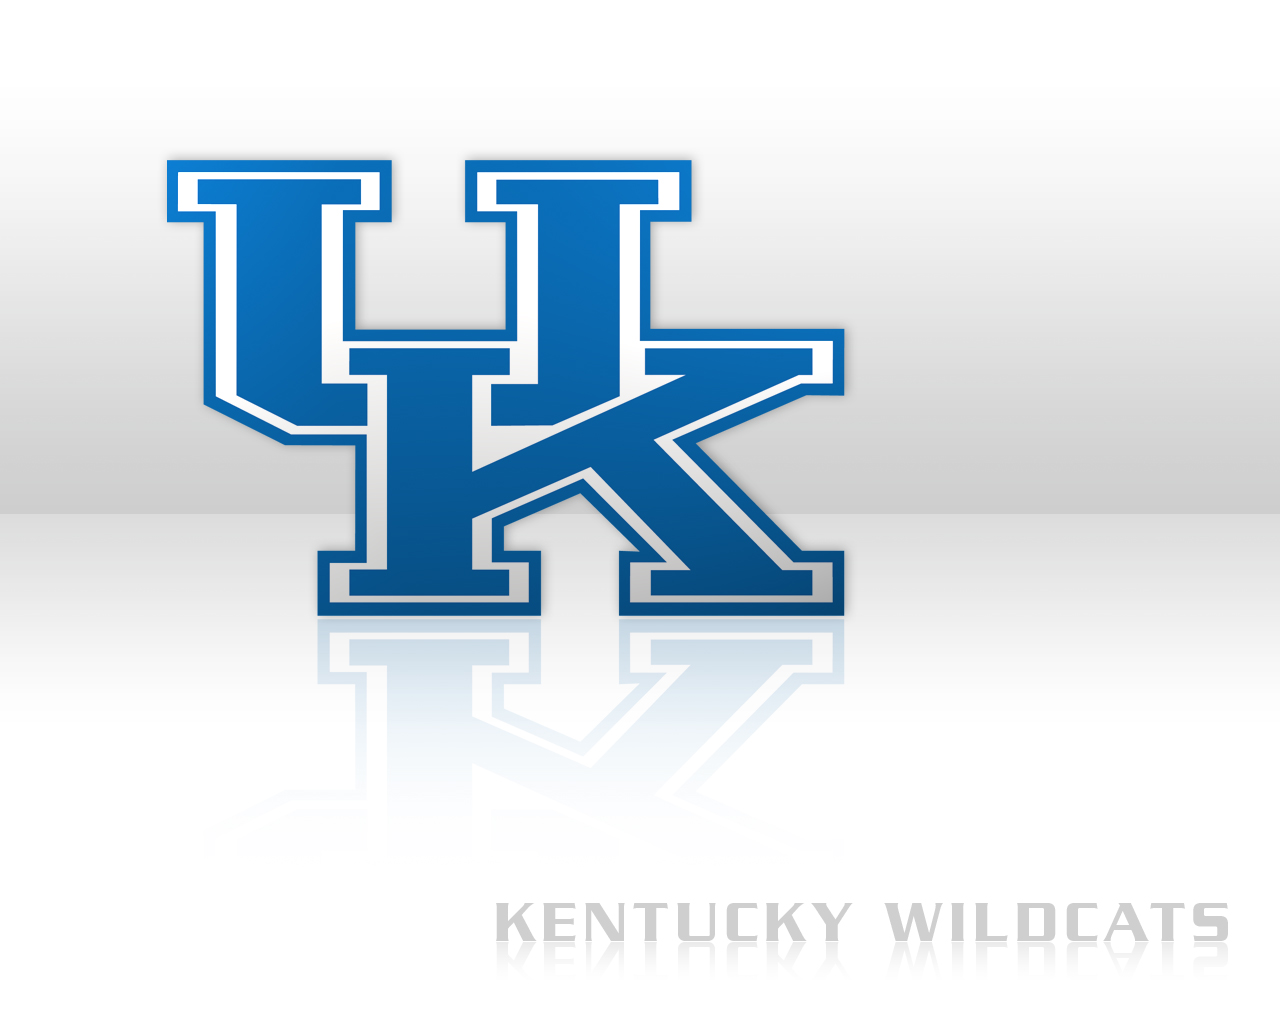 Uncategorized WildcatRobs Kentucky Wallpaper Blog 1280x1024